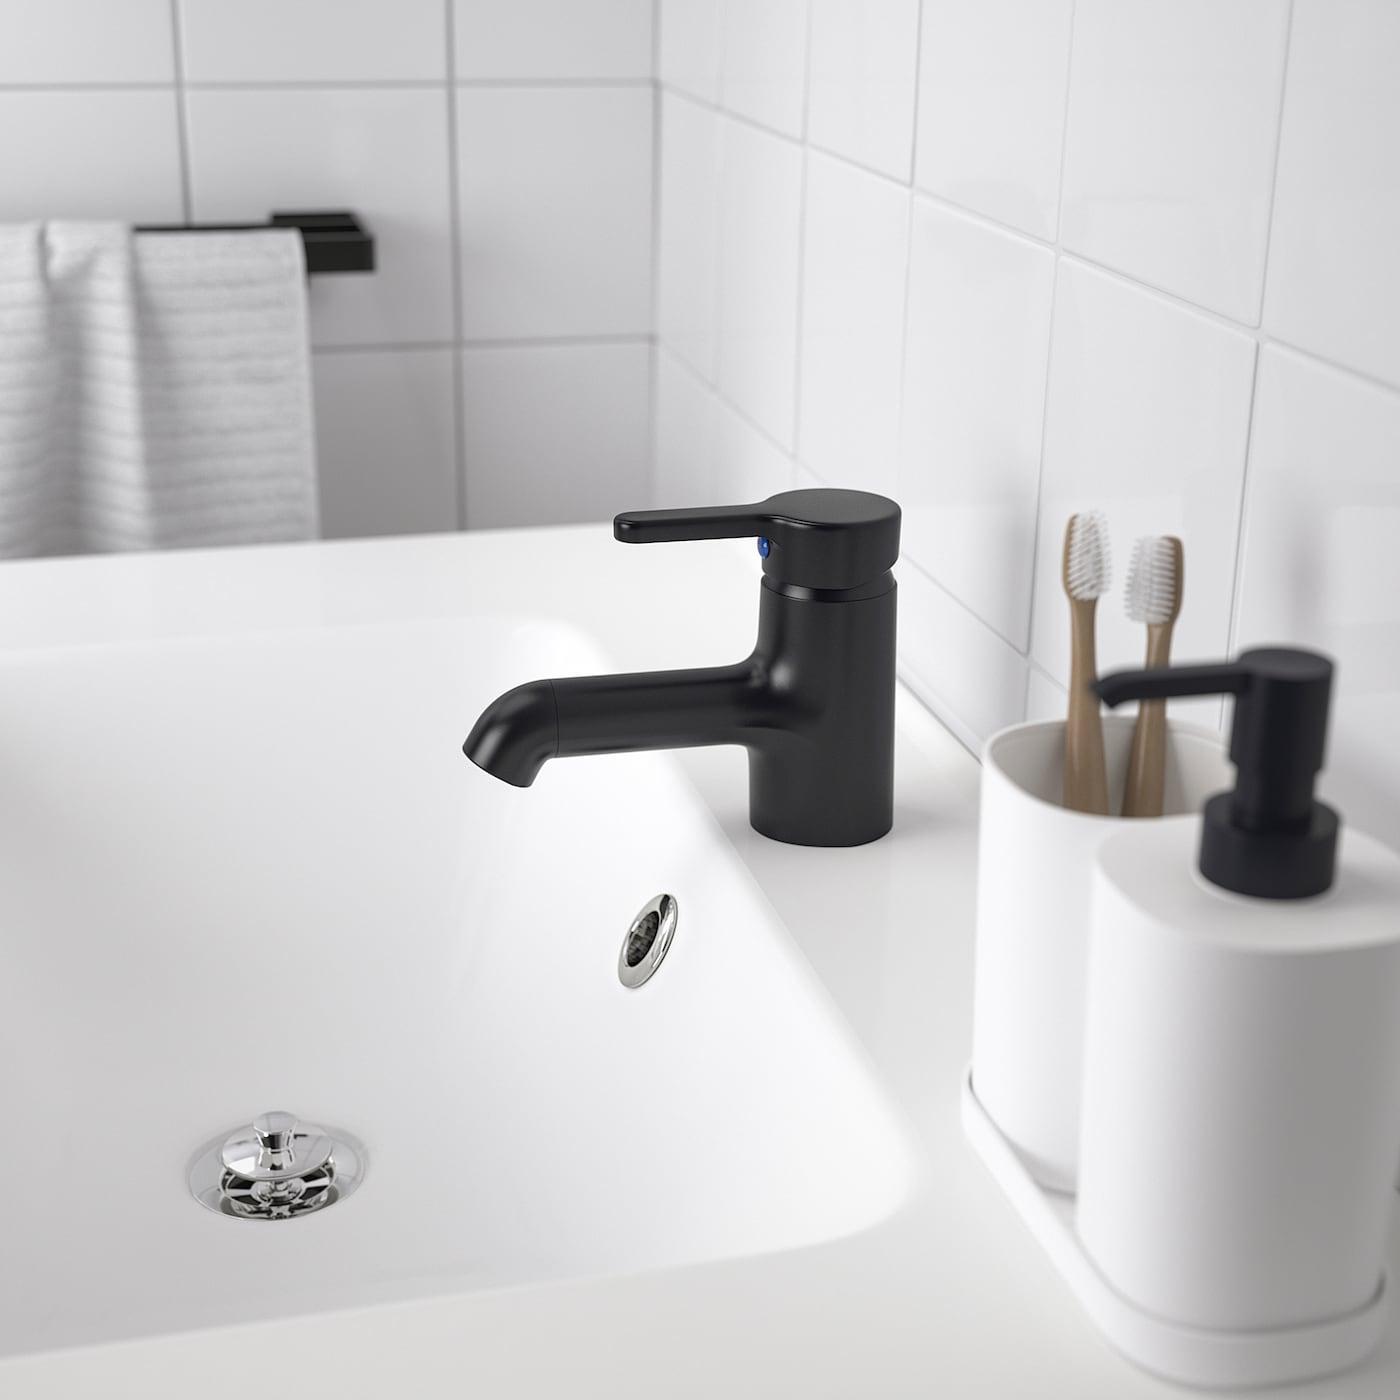 SALJEN Wash-basin mixer tap, black